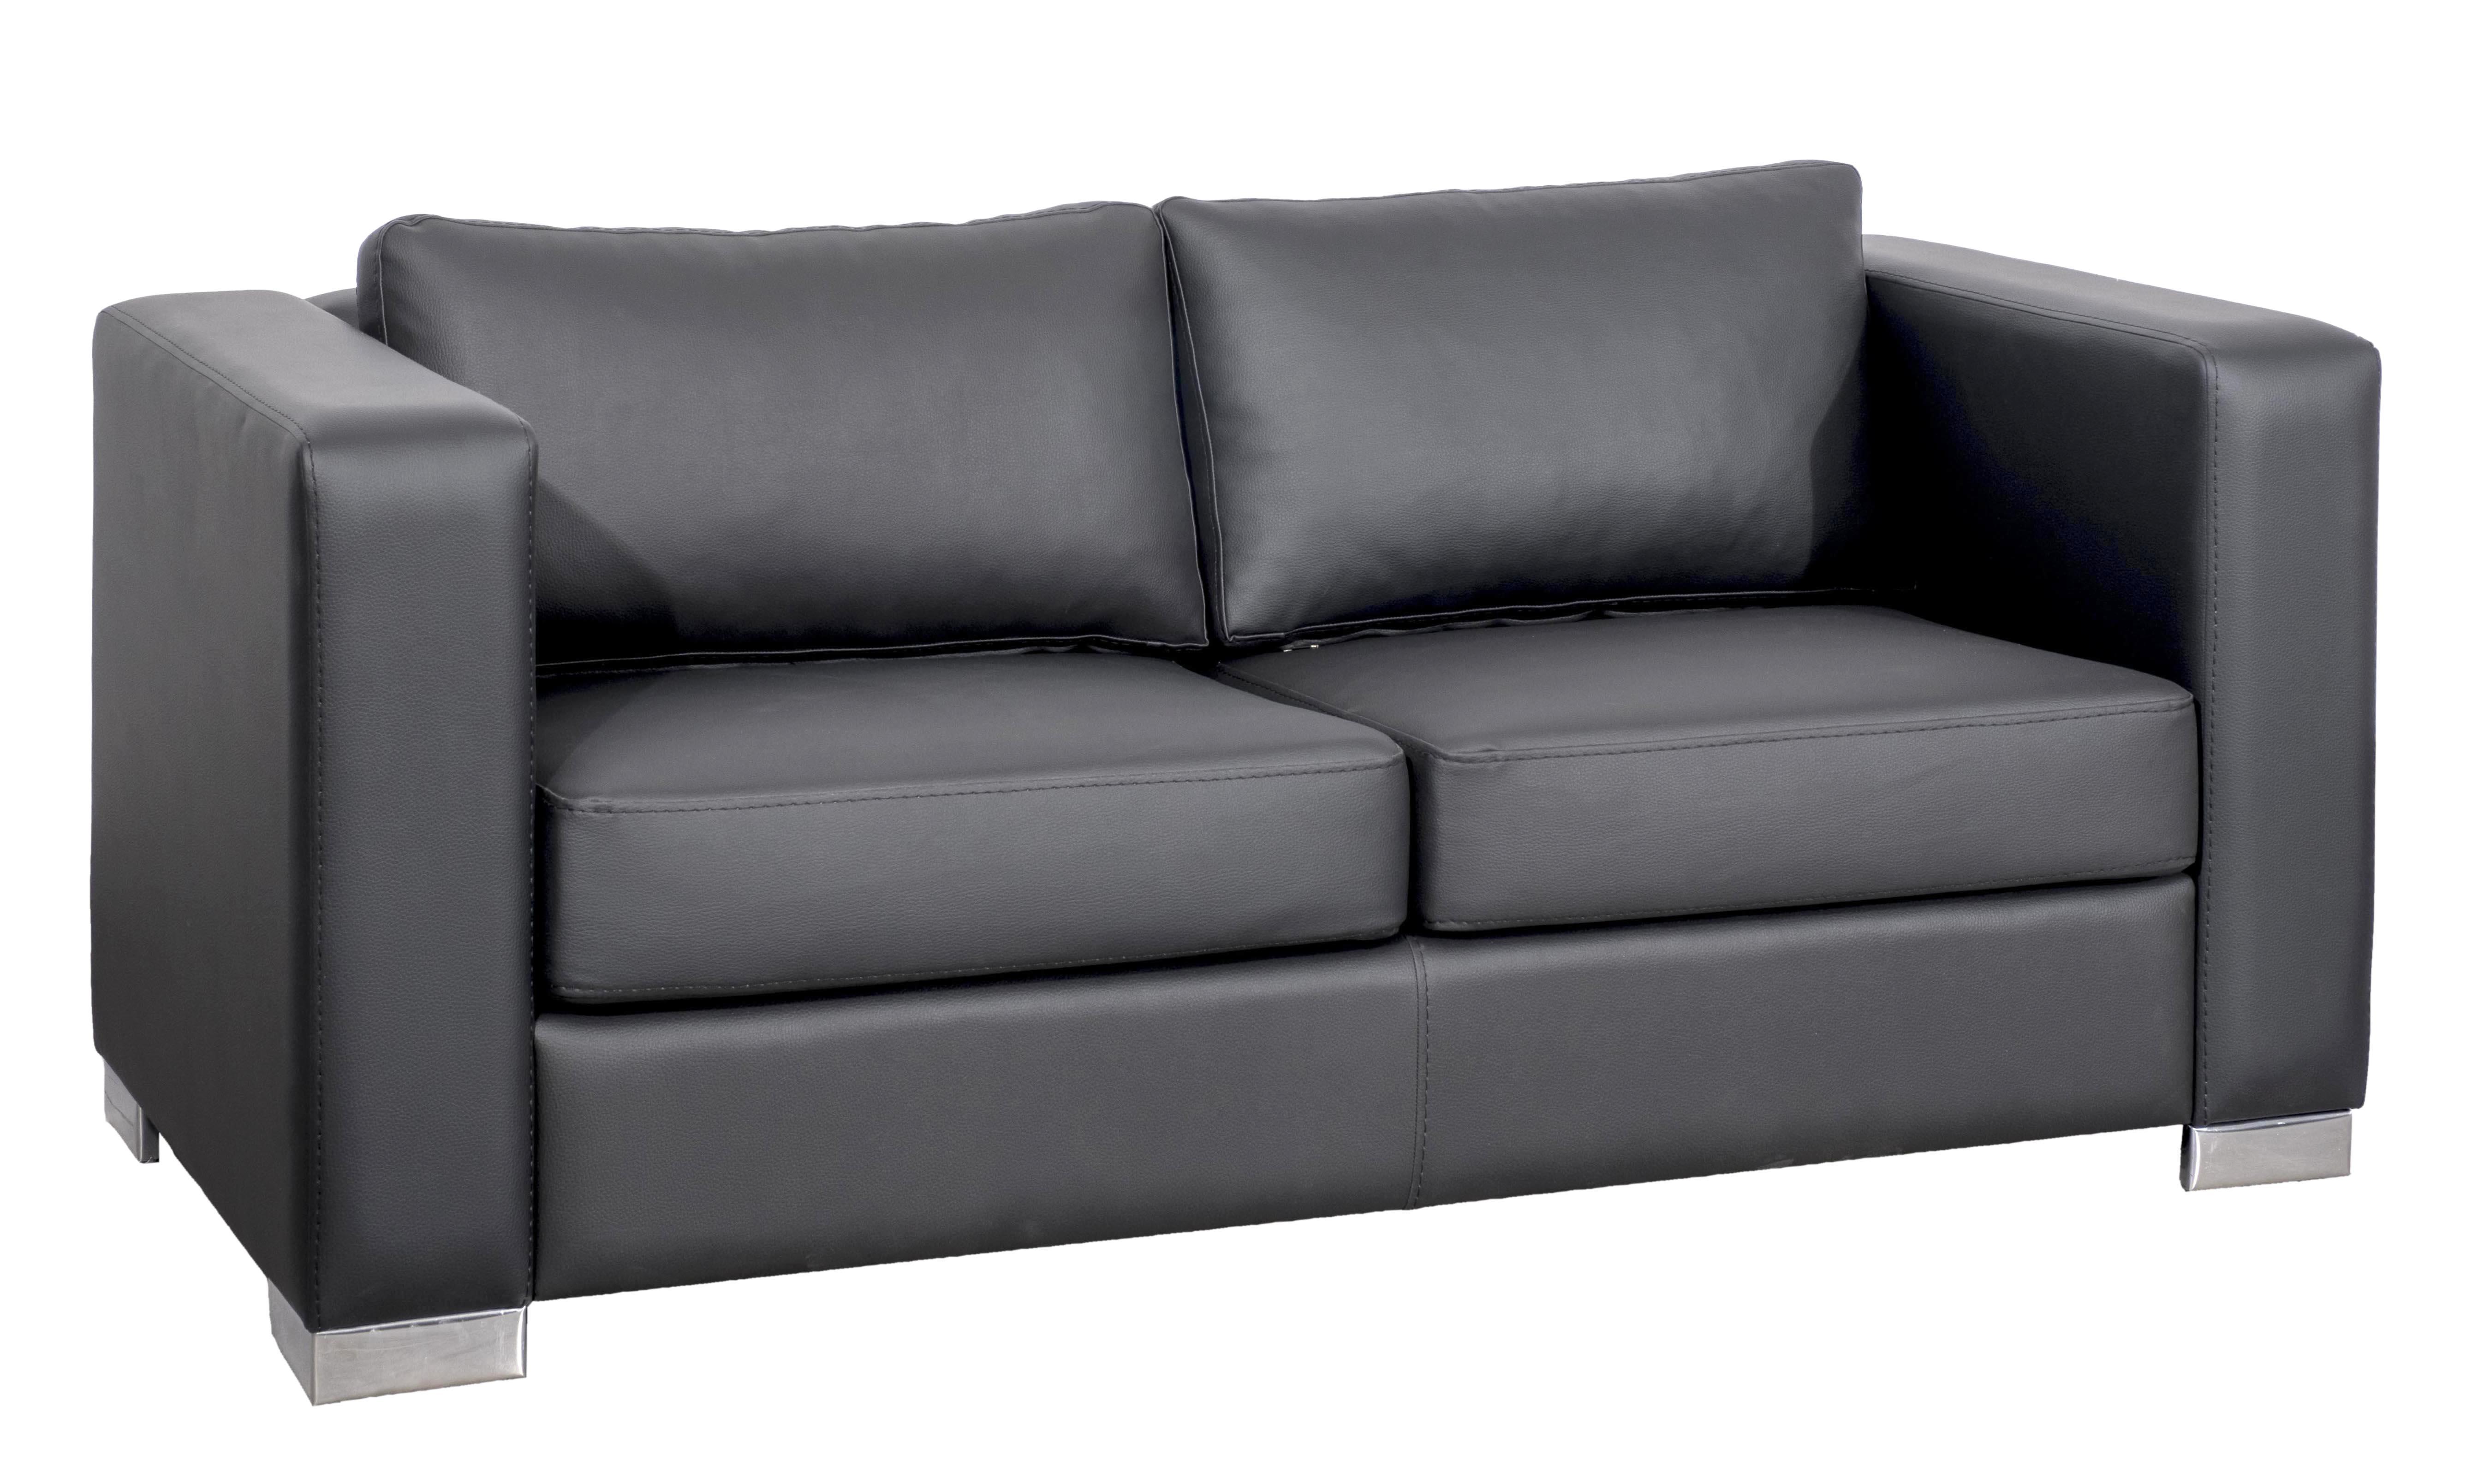 salon carre interieurs. Black Bedroom Furniture Sets. Home Design Ideas